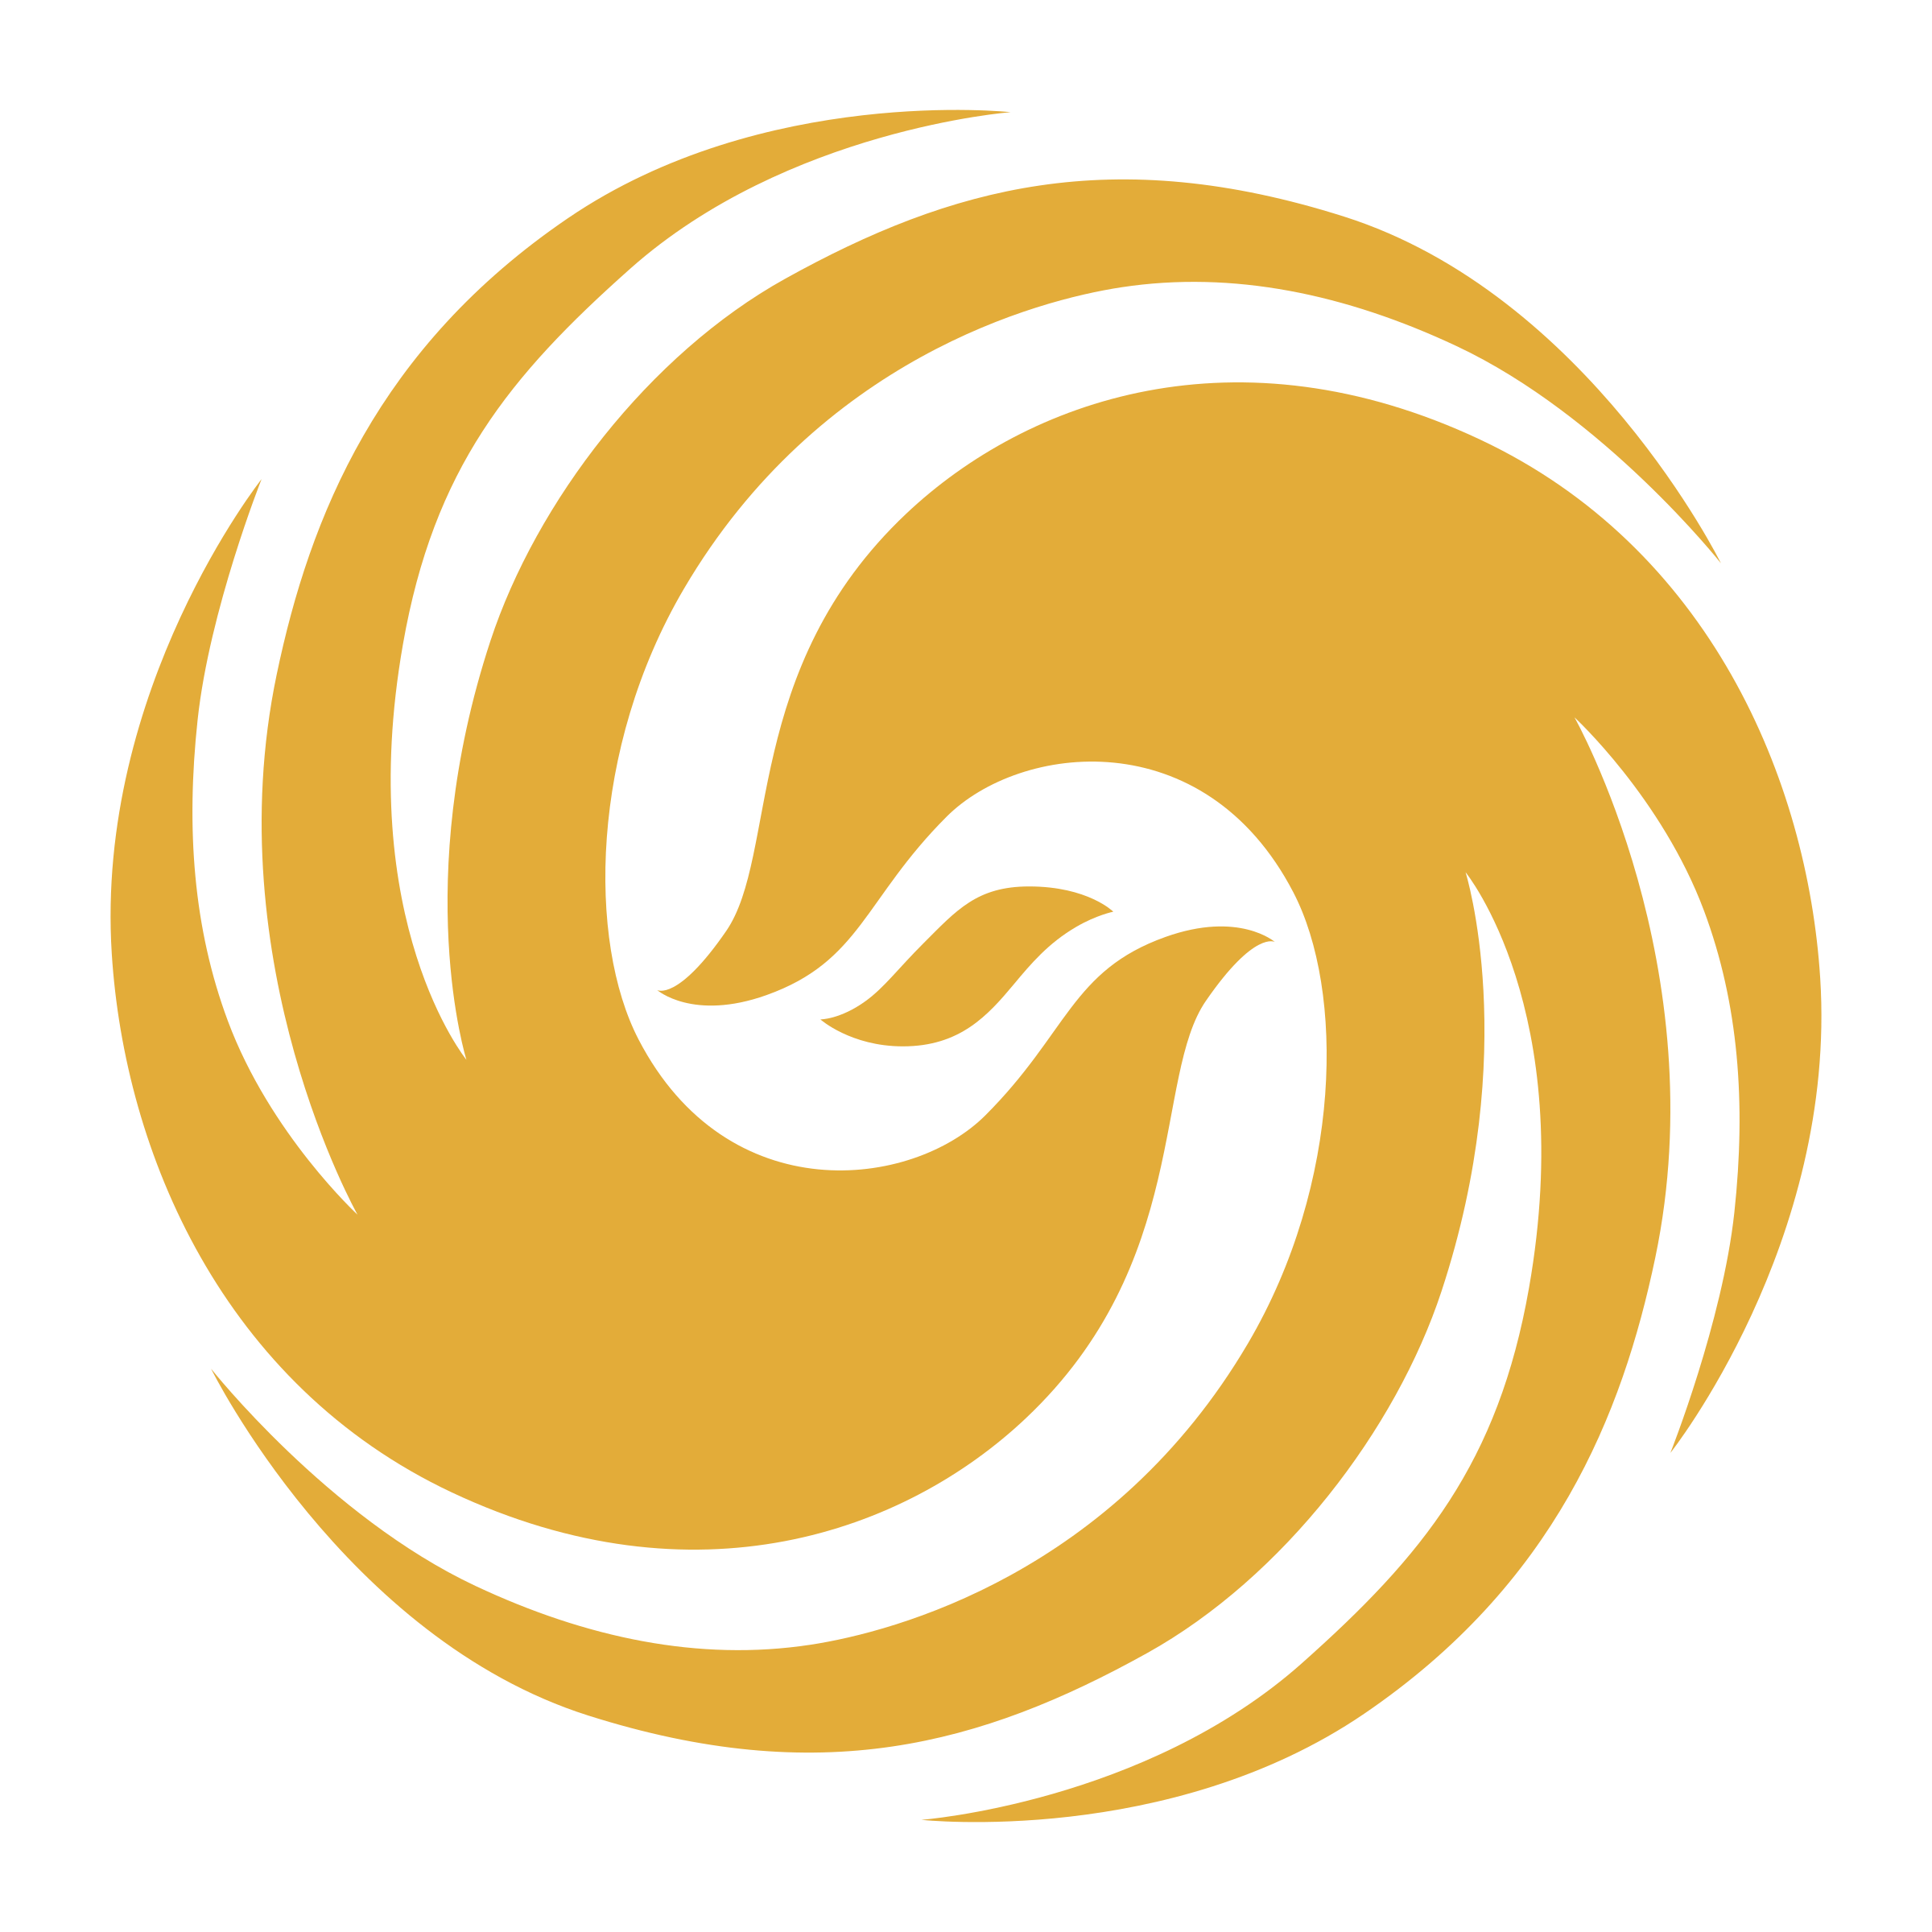 clipart stock Phoenix Satellite TV Logo PNG Transparent